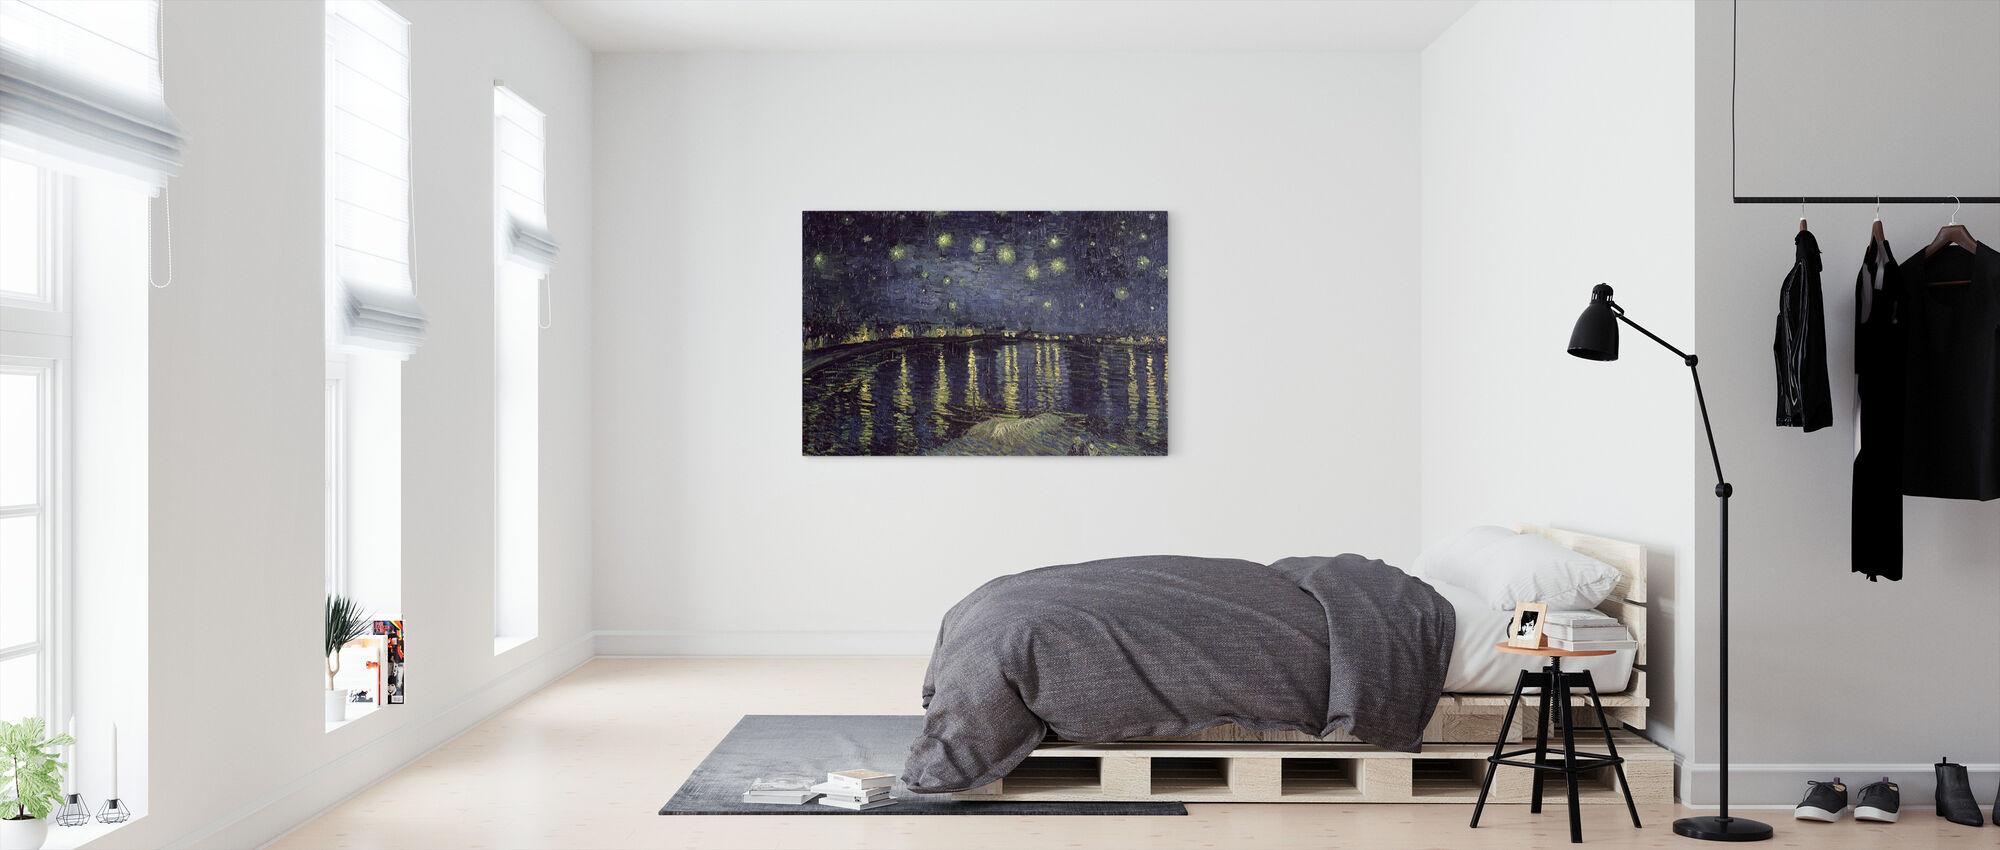 Starry Night Vincent Van Gogh Nastrojowy Obraz Na